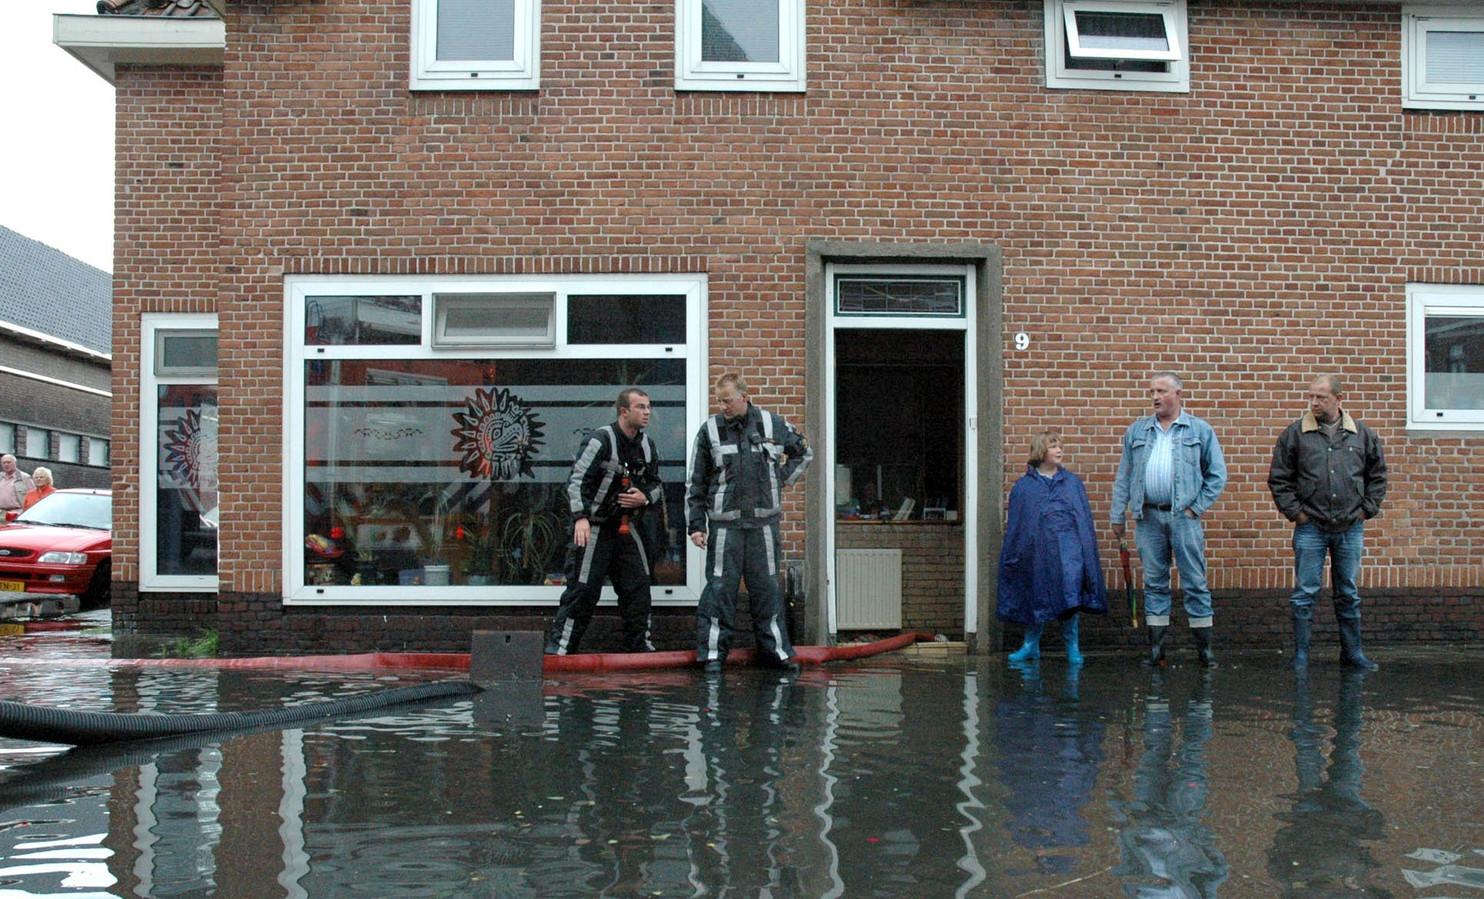 Woningen in Rotterdam die na een hoosbui blank kwamen te staan (archieffoto)